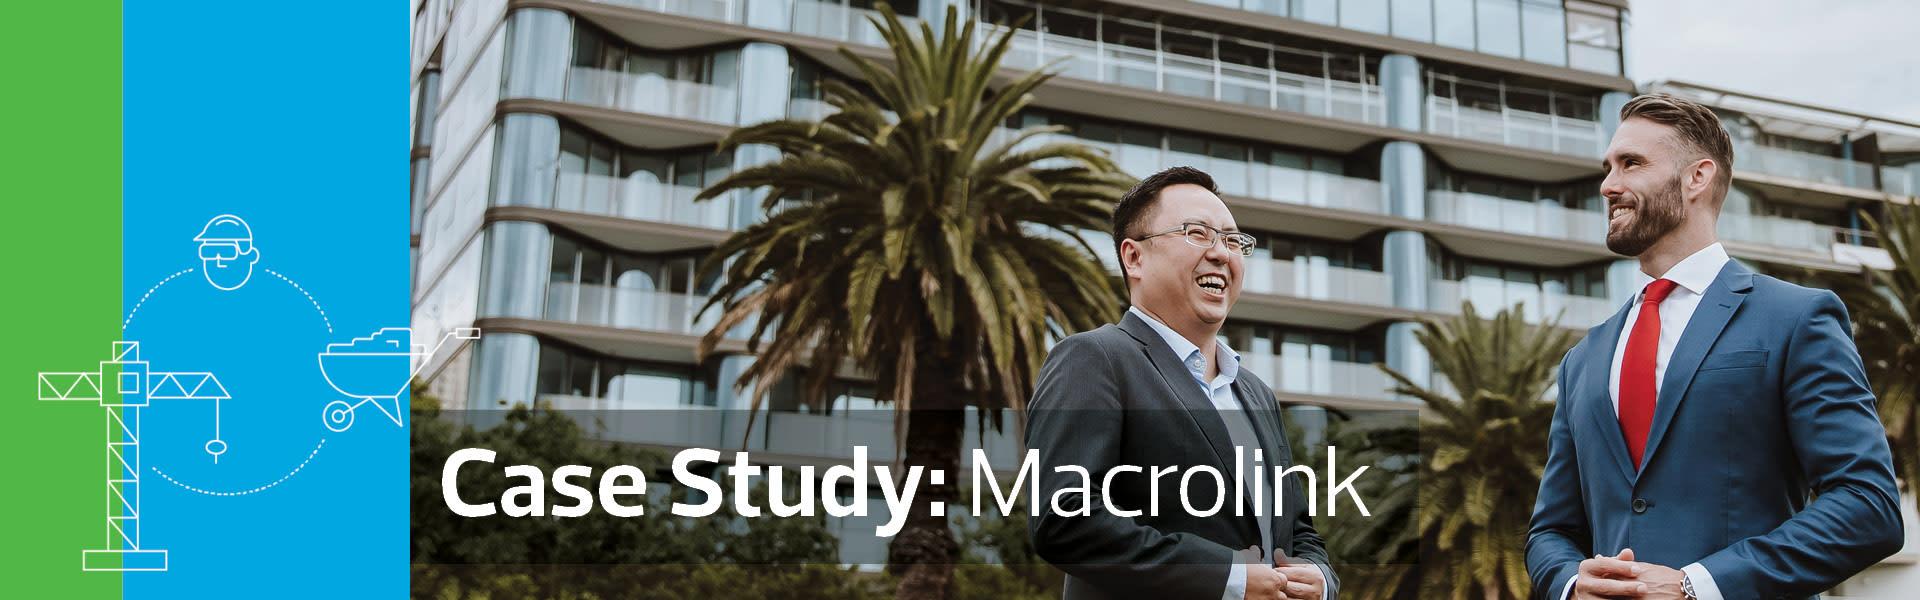 Case Study: Macrolink